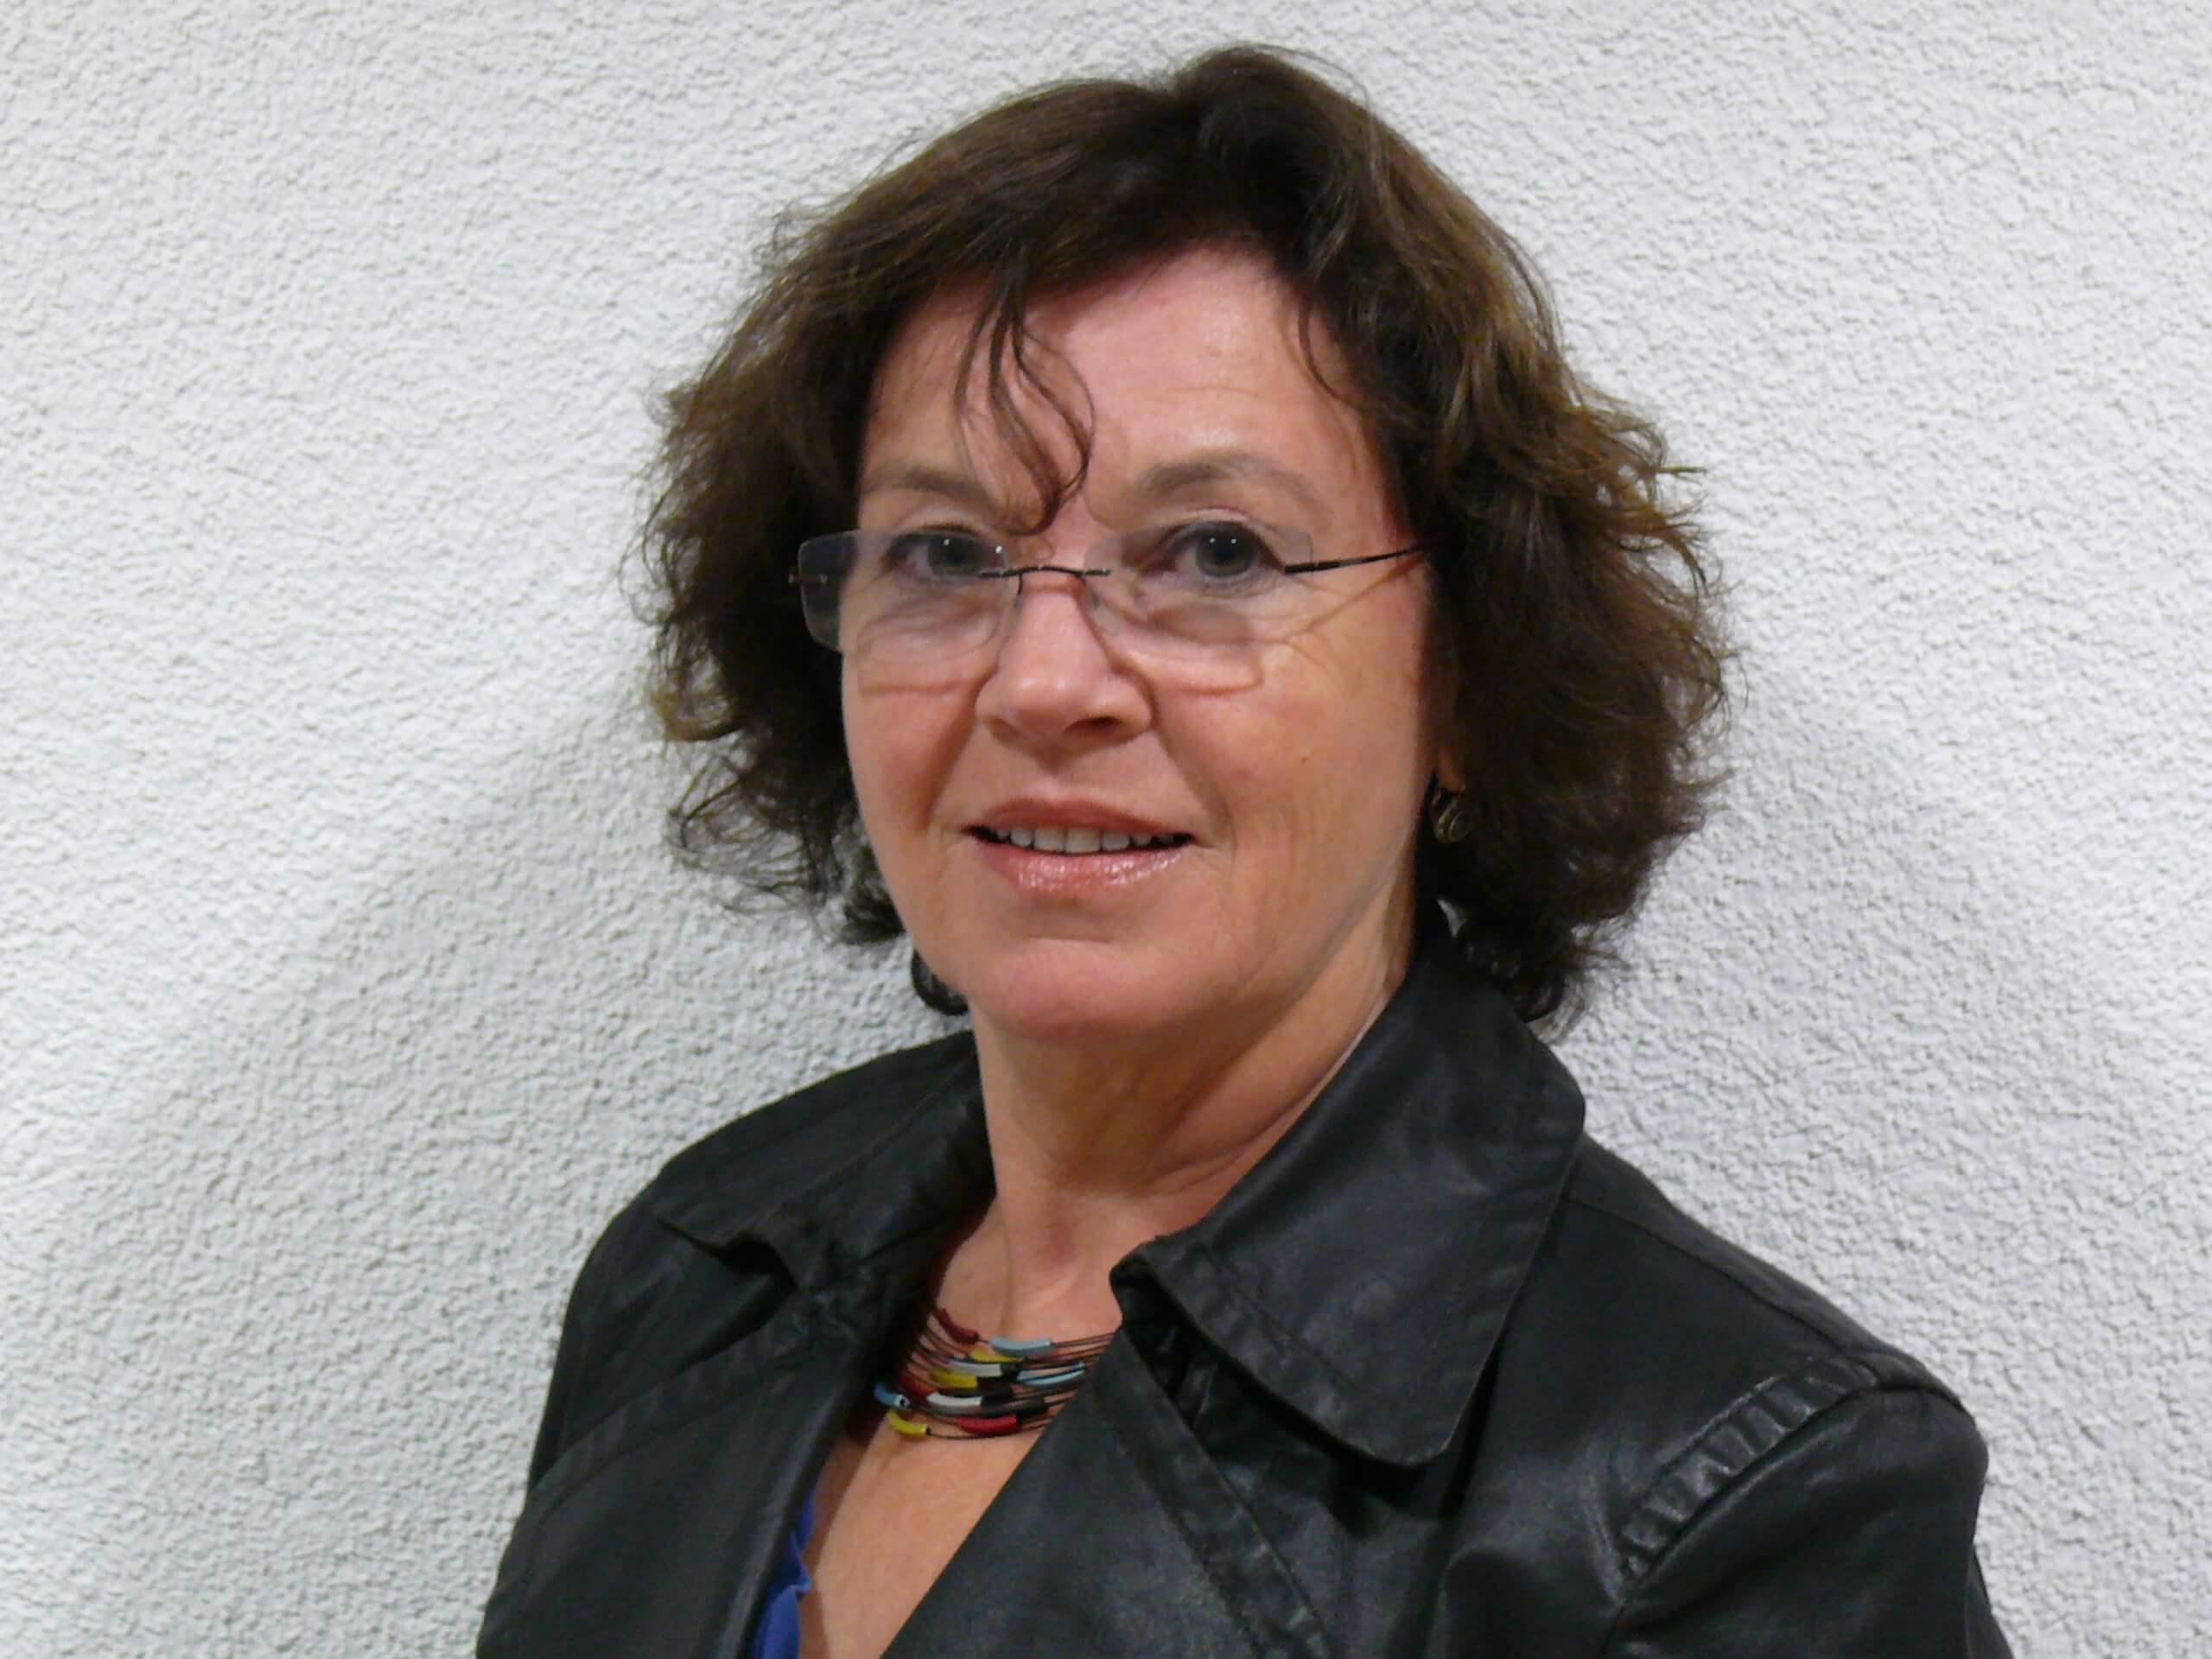 Elisabeth Egle